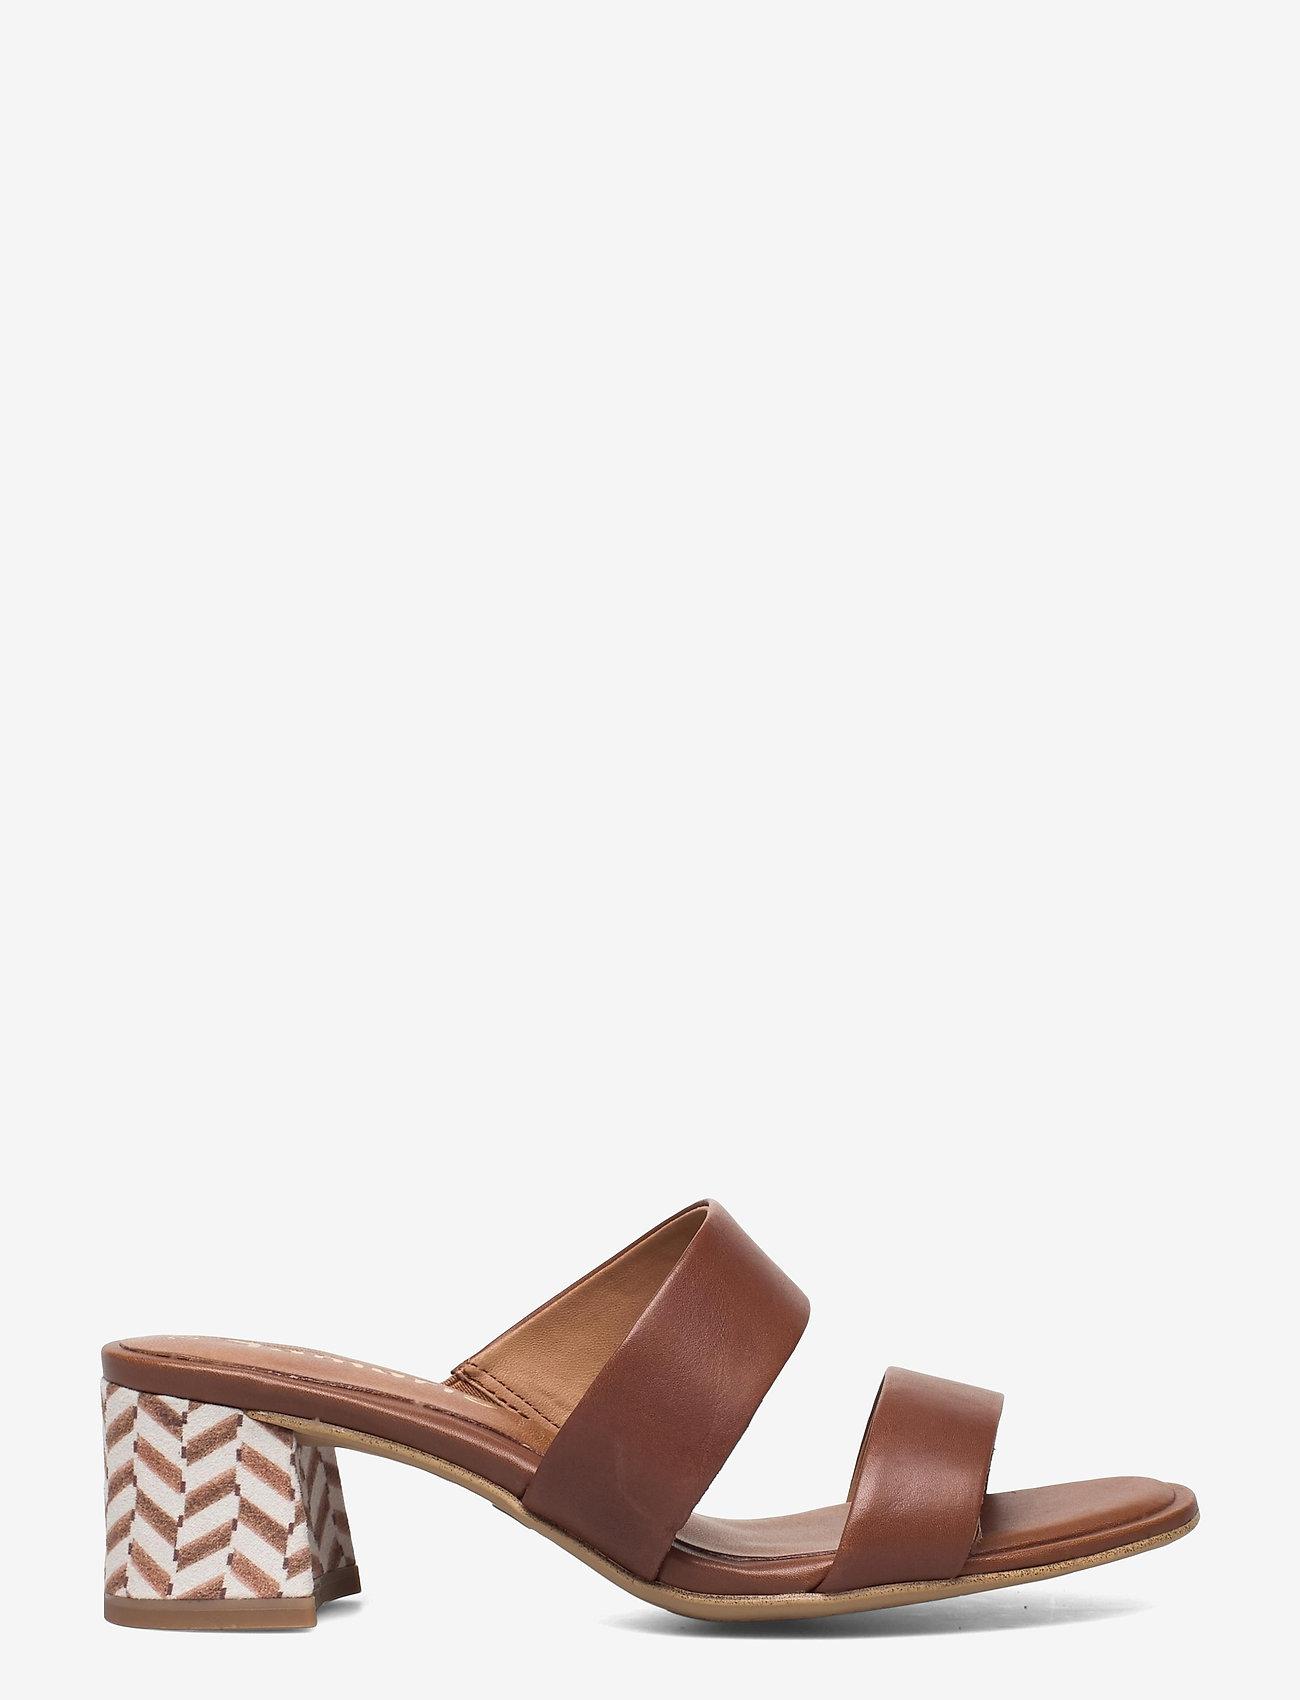 Tamaris - Woms Slides - Swida - augstpapēžu sandales - cognac - 1